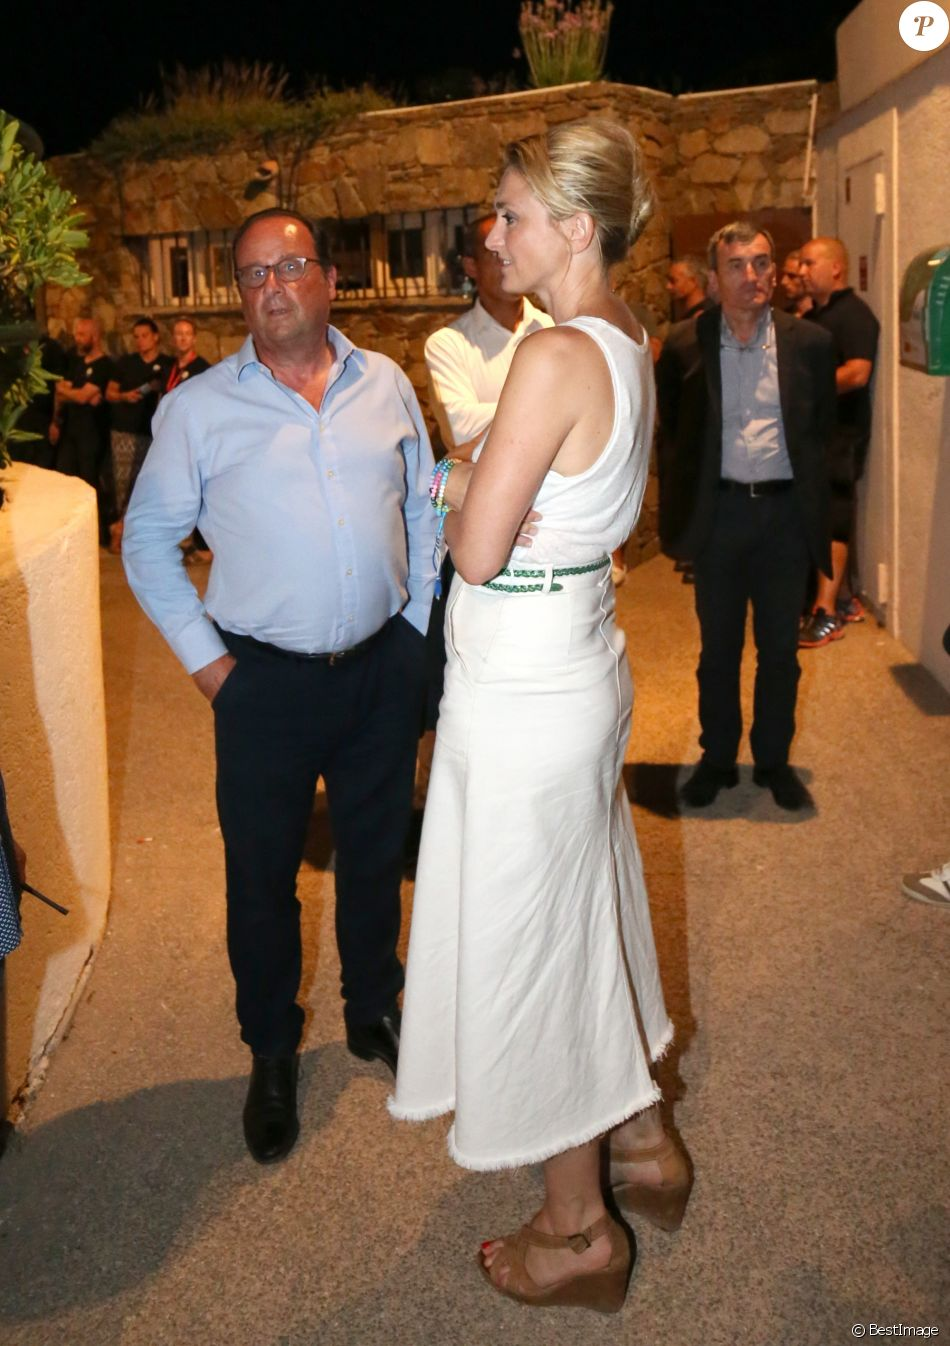 rencontre rapide gay wedding dress a Brest